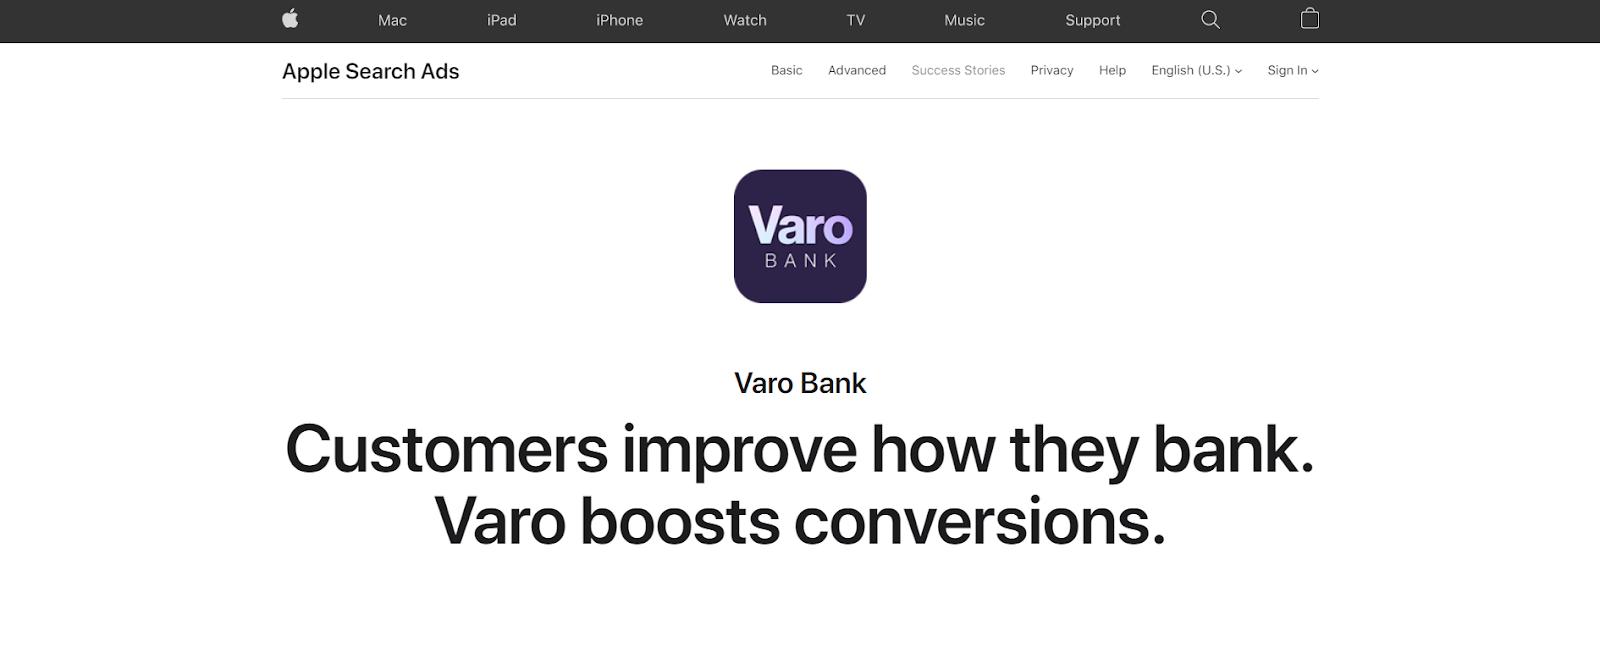 Varo Bank ad with 2 slogans.